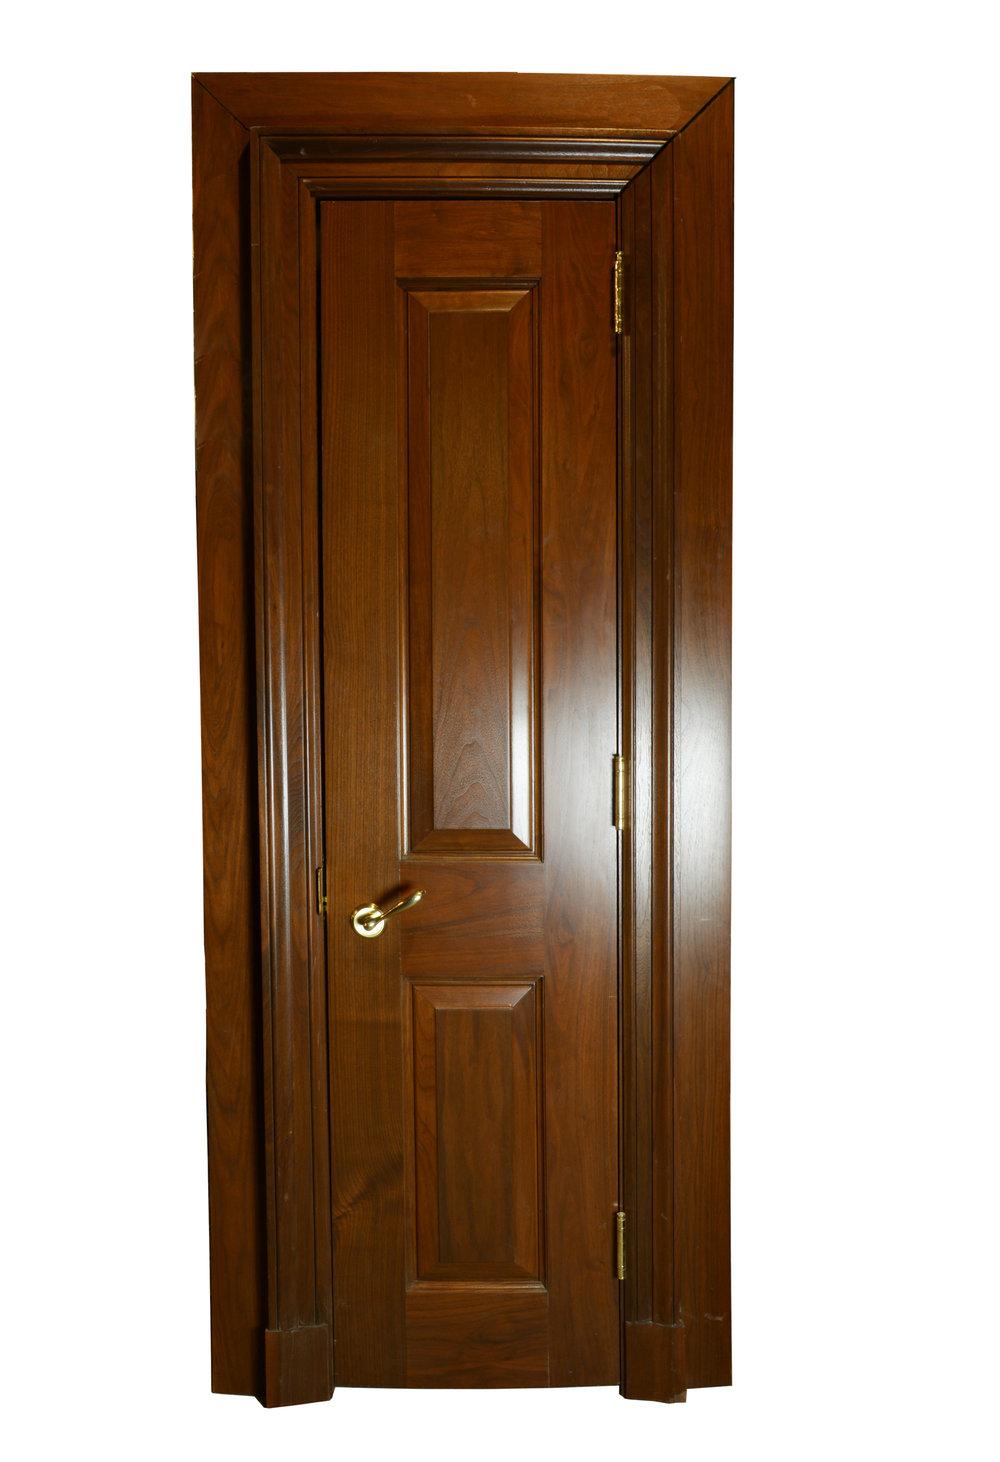 Walnut Closet Door Architectural Antiques